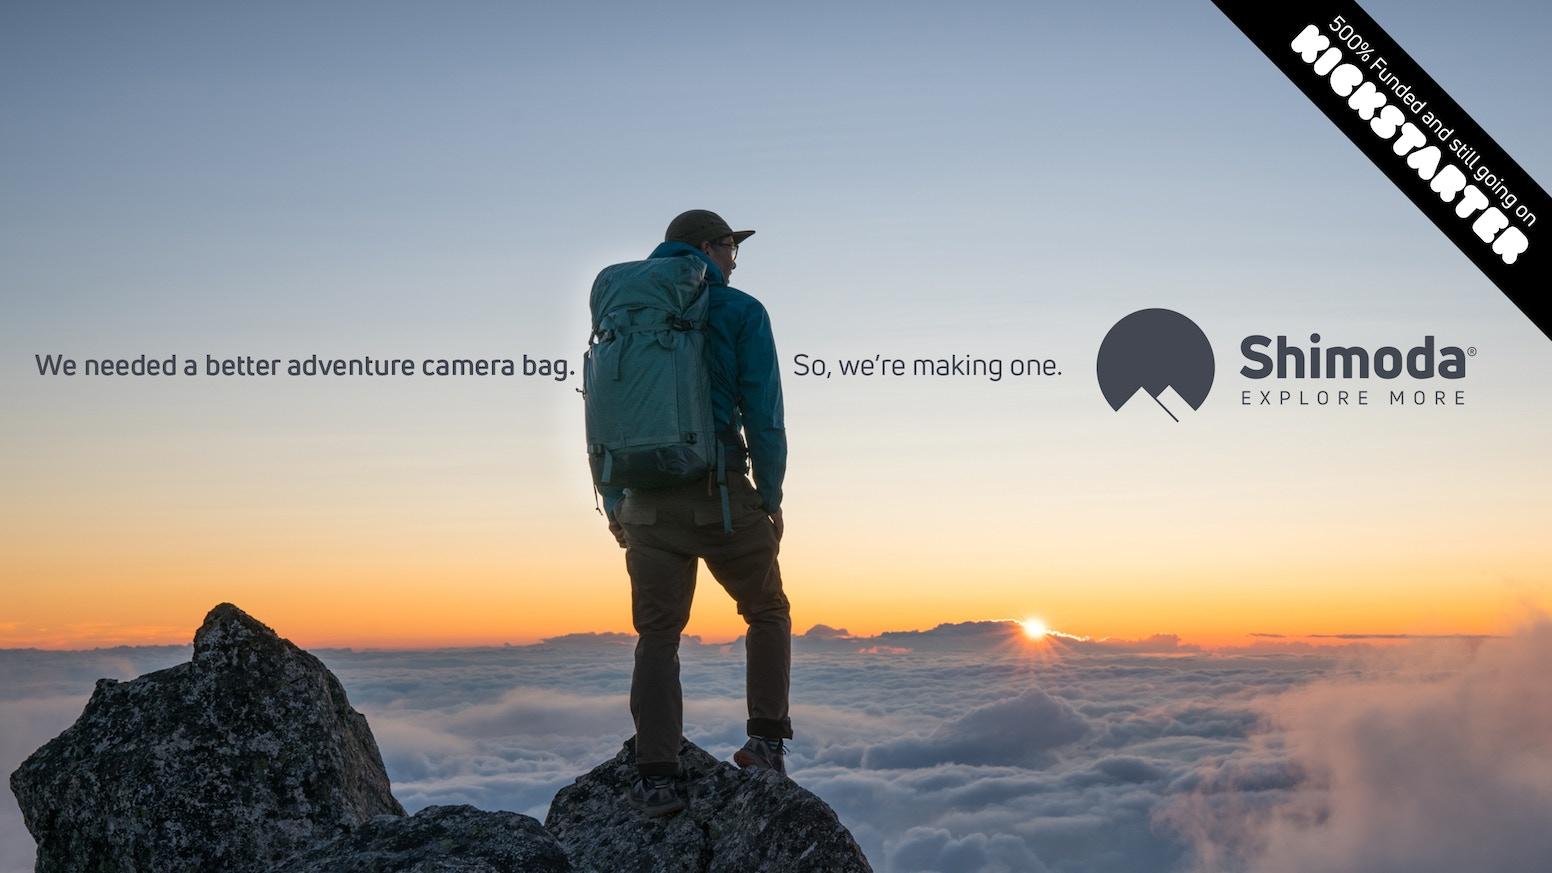 Shimoda Adventure Camera Bags